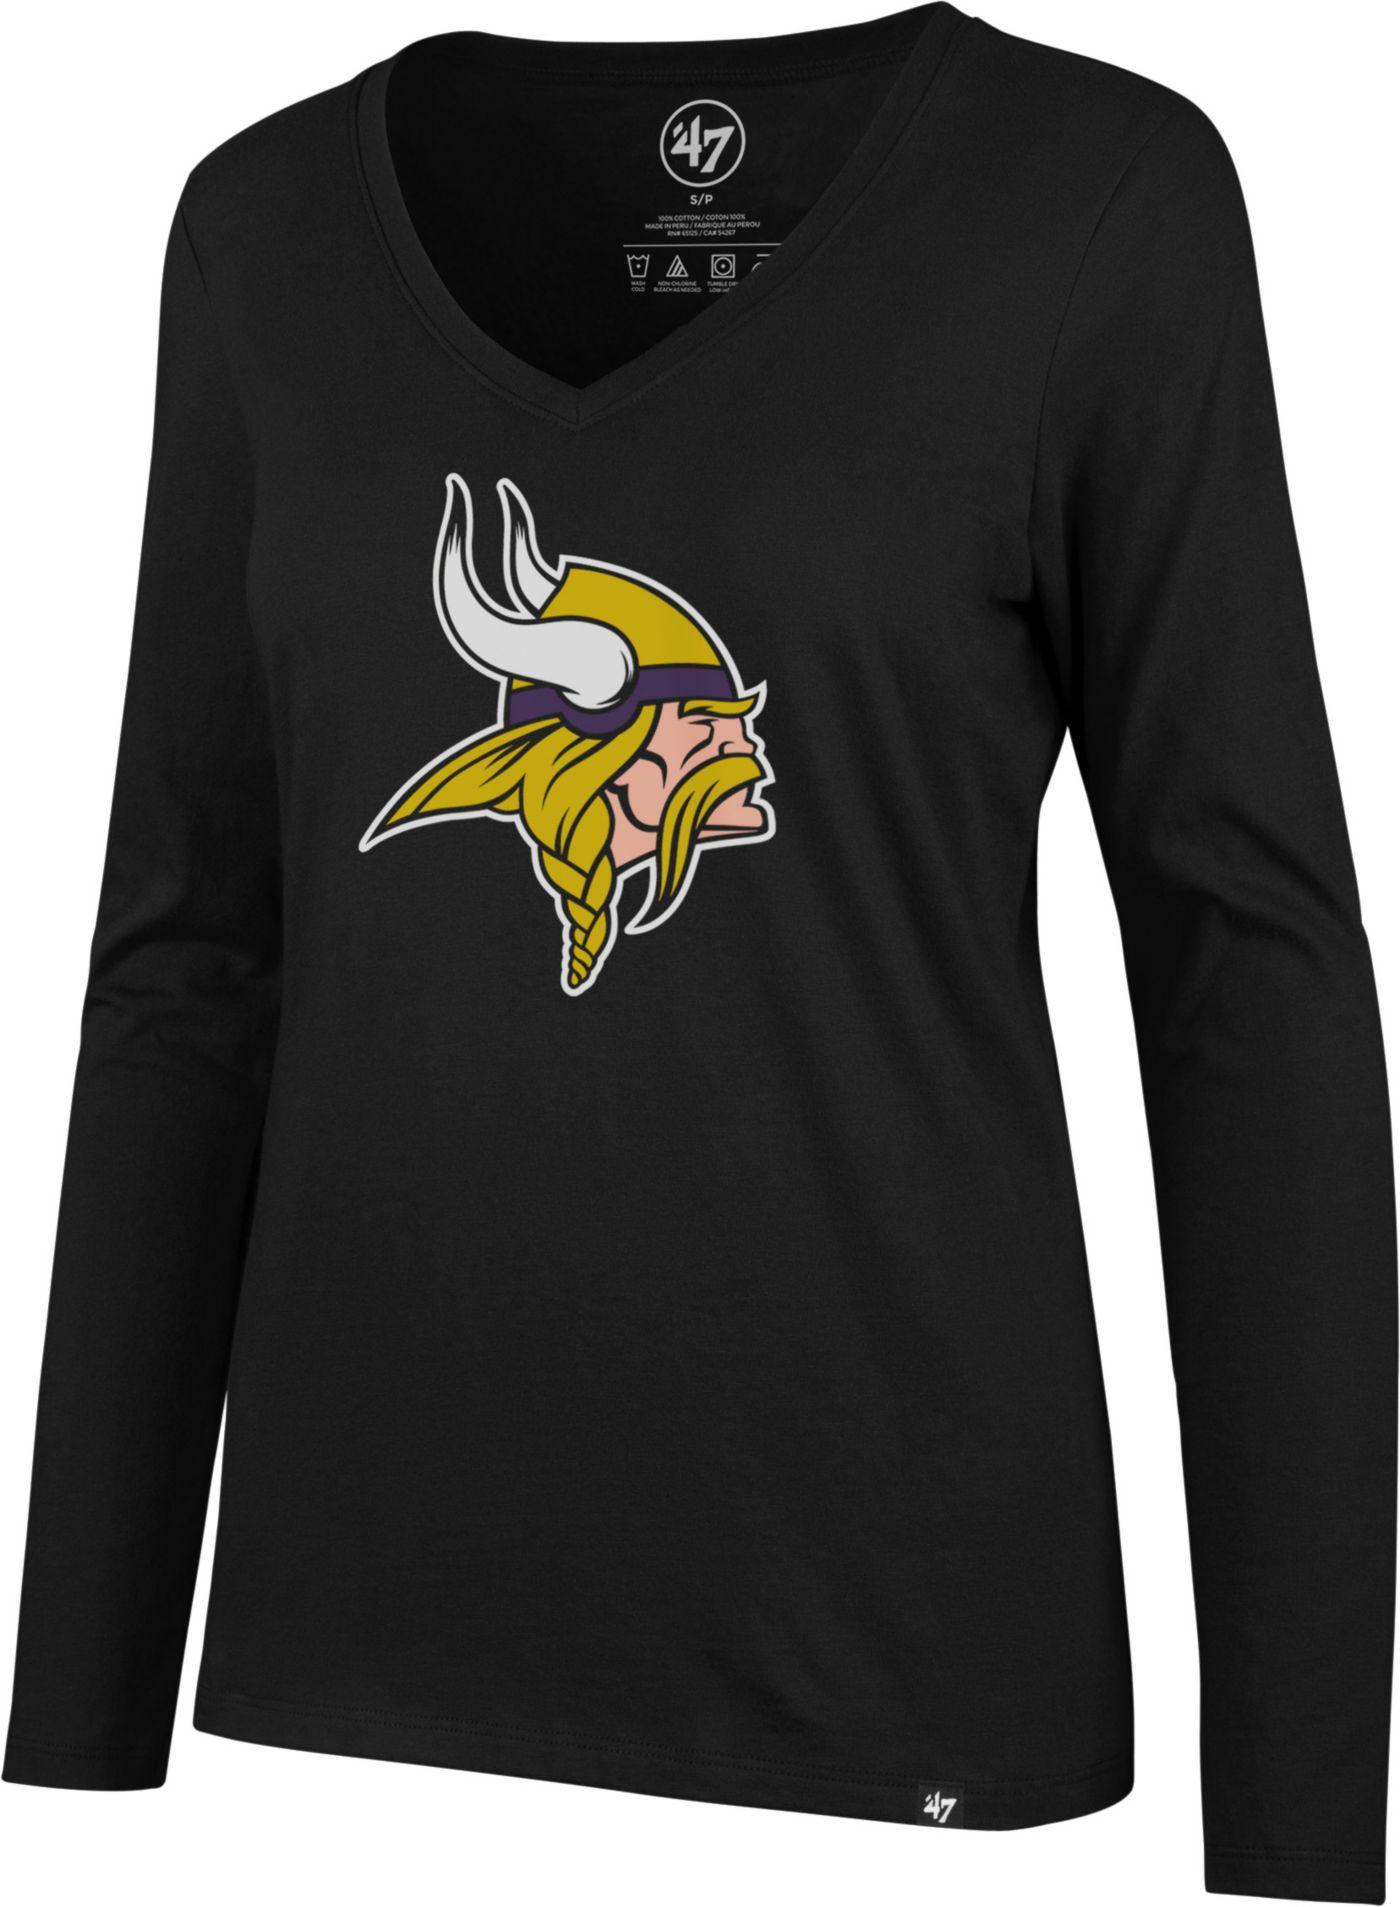 '47 Women's Minnesota Vikings Logo Black Long Sleeve Shirt